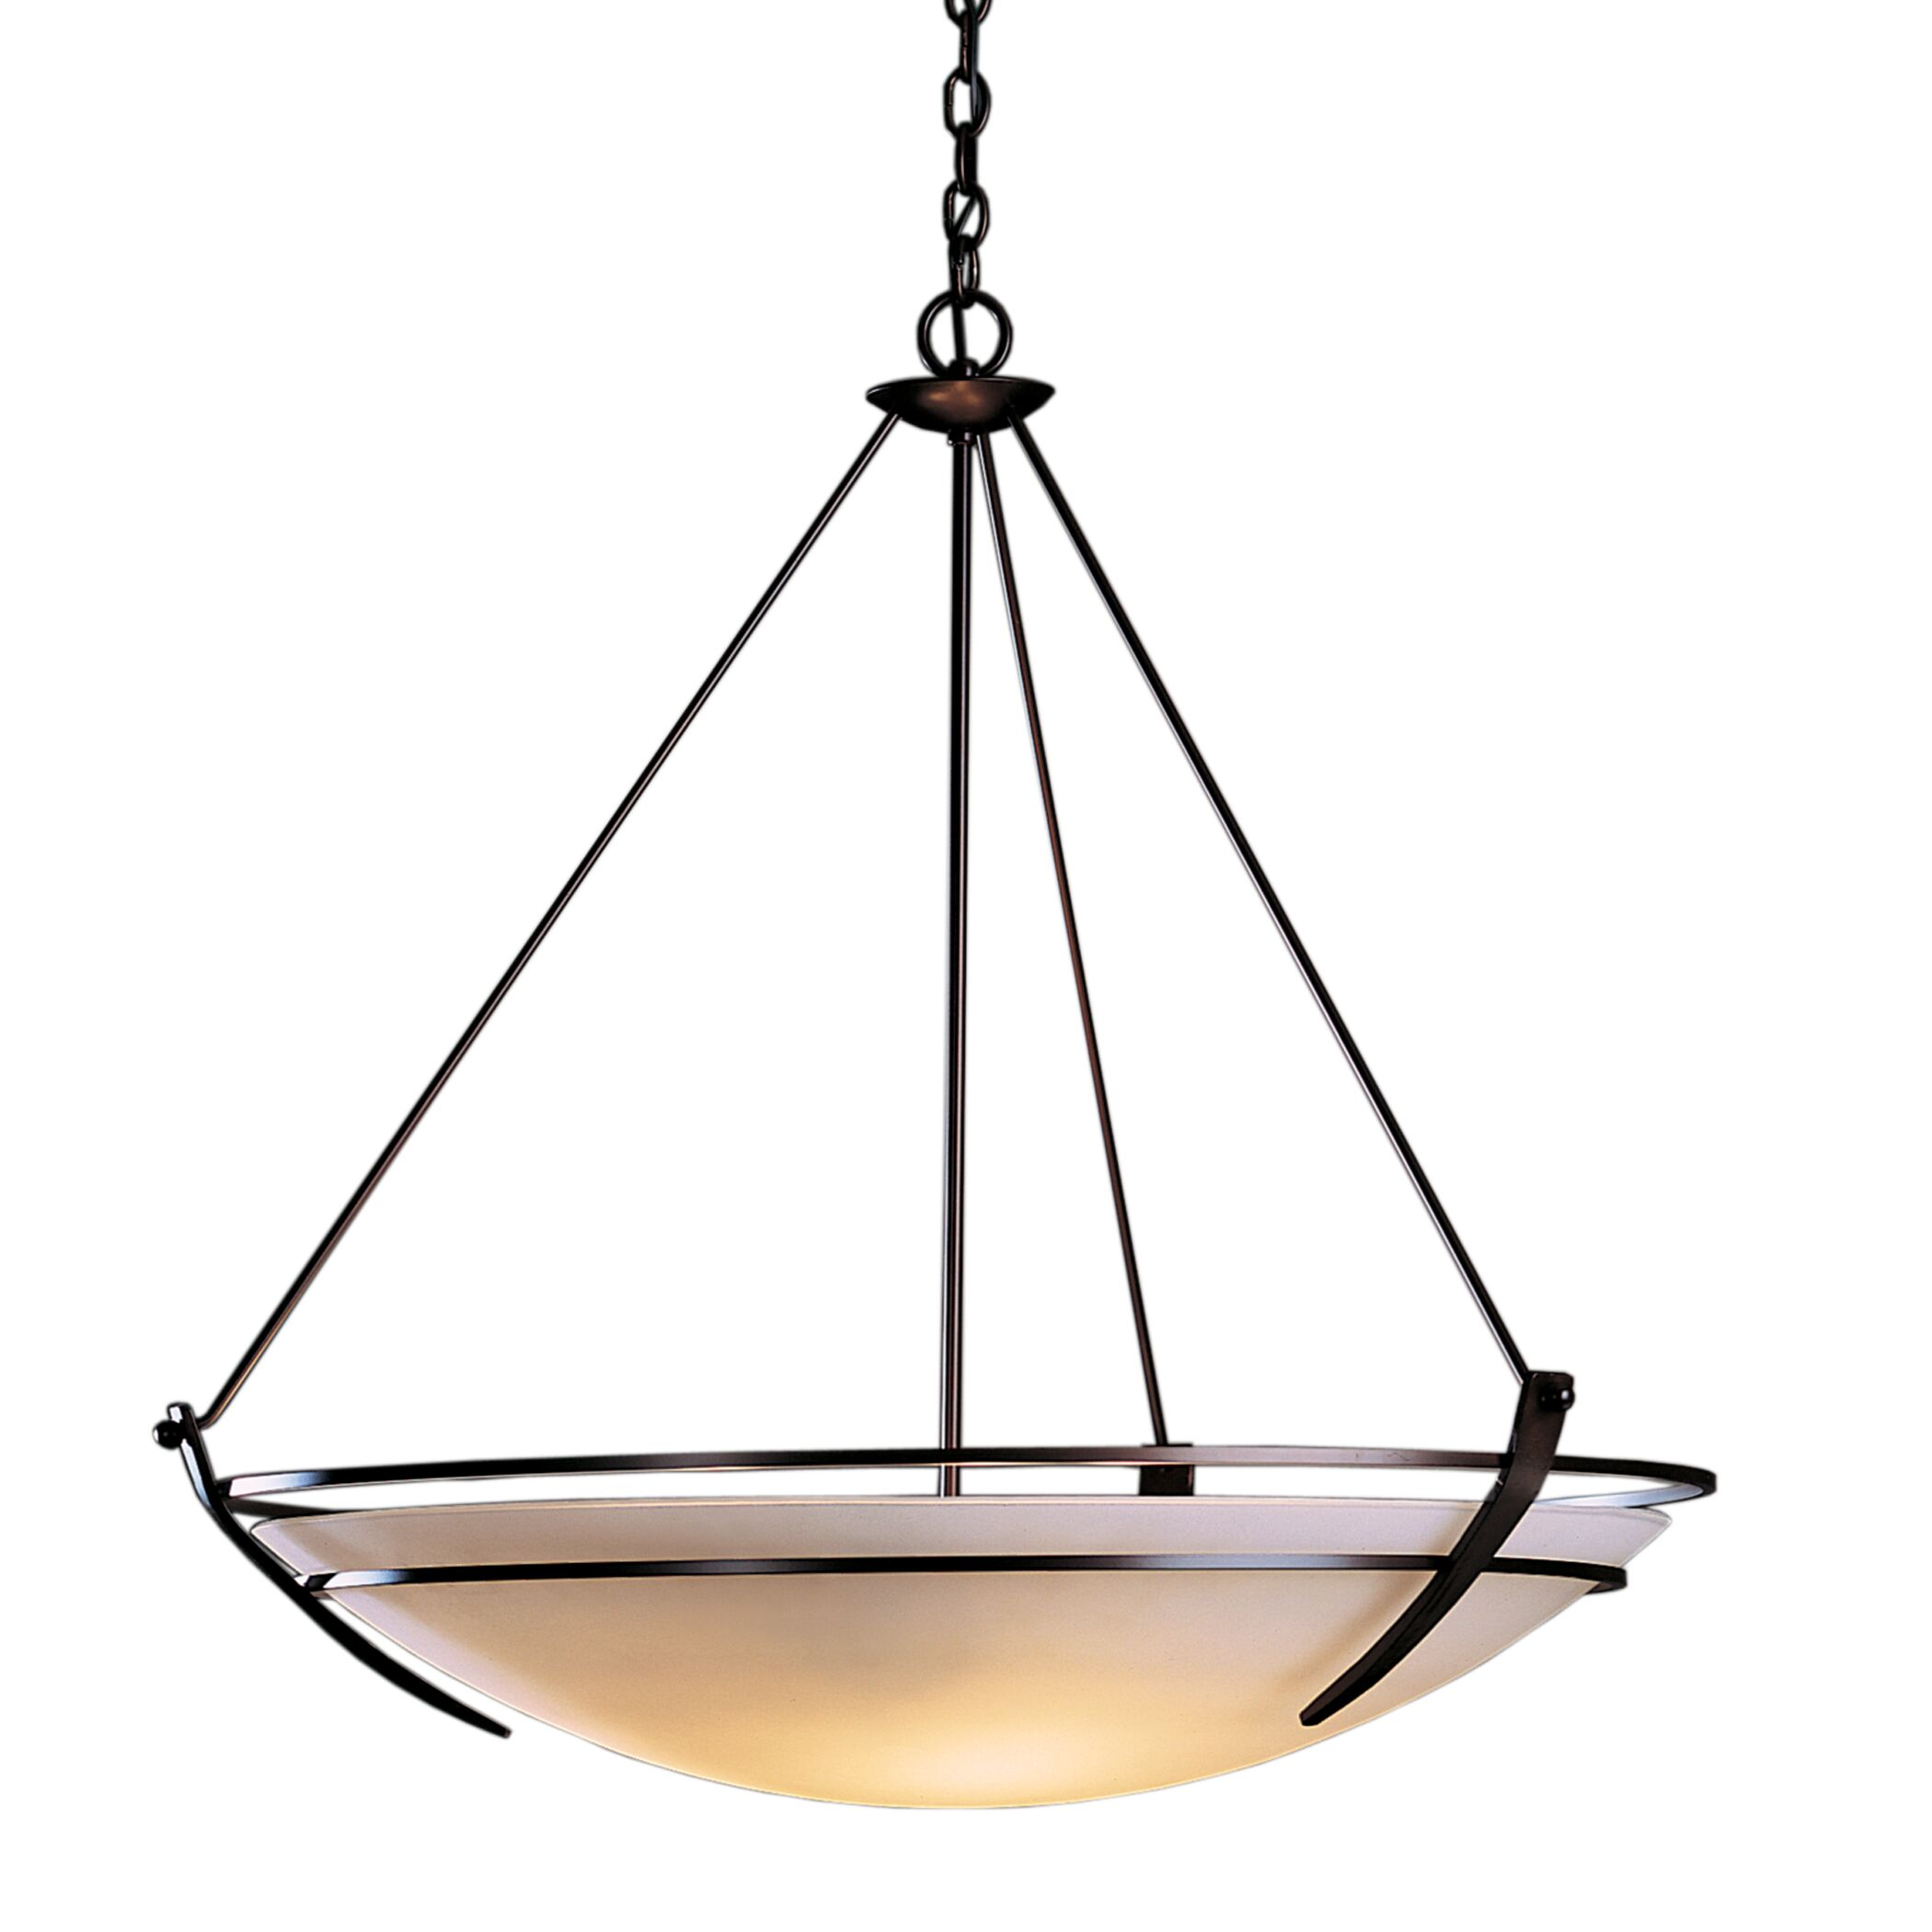 Tryne 3-Light Bowl Pendant Finish: Mahogany, Shade Color: Opal, Size: 32.9